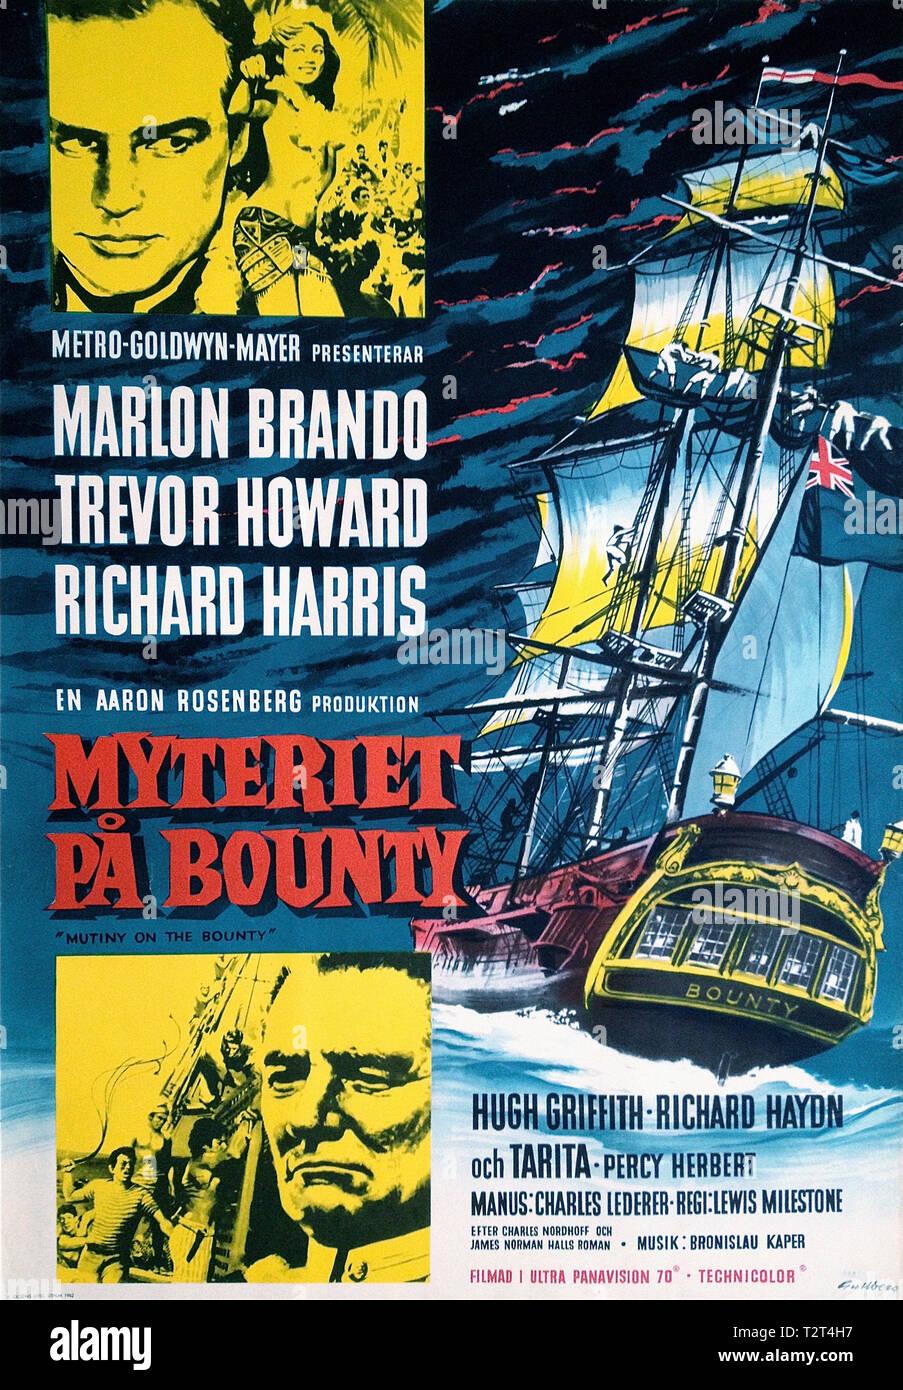 LES REVOLTES DU BOUNTY MUTINY ON THE BOUNTY 1962 de Lewis Milestone affiche suedoise histoire vraie; aventure; true story; adventure; swedish poster;  Stock Photo